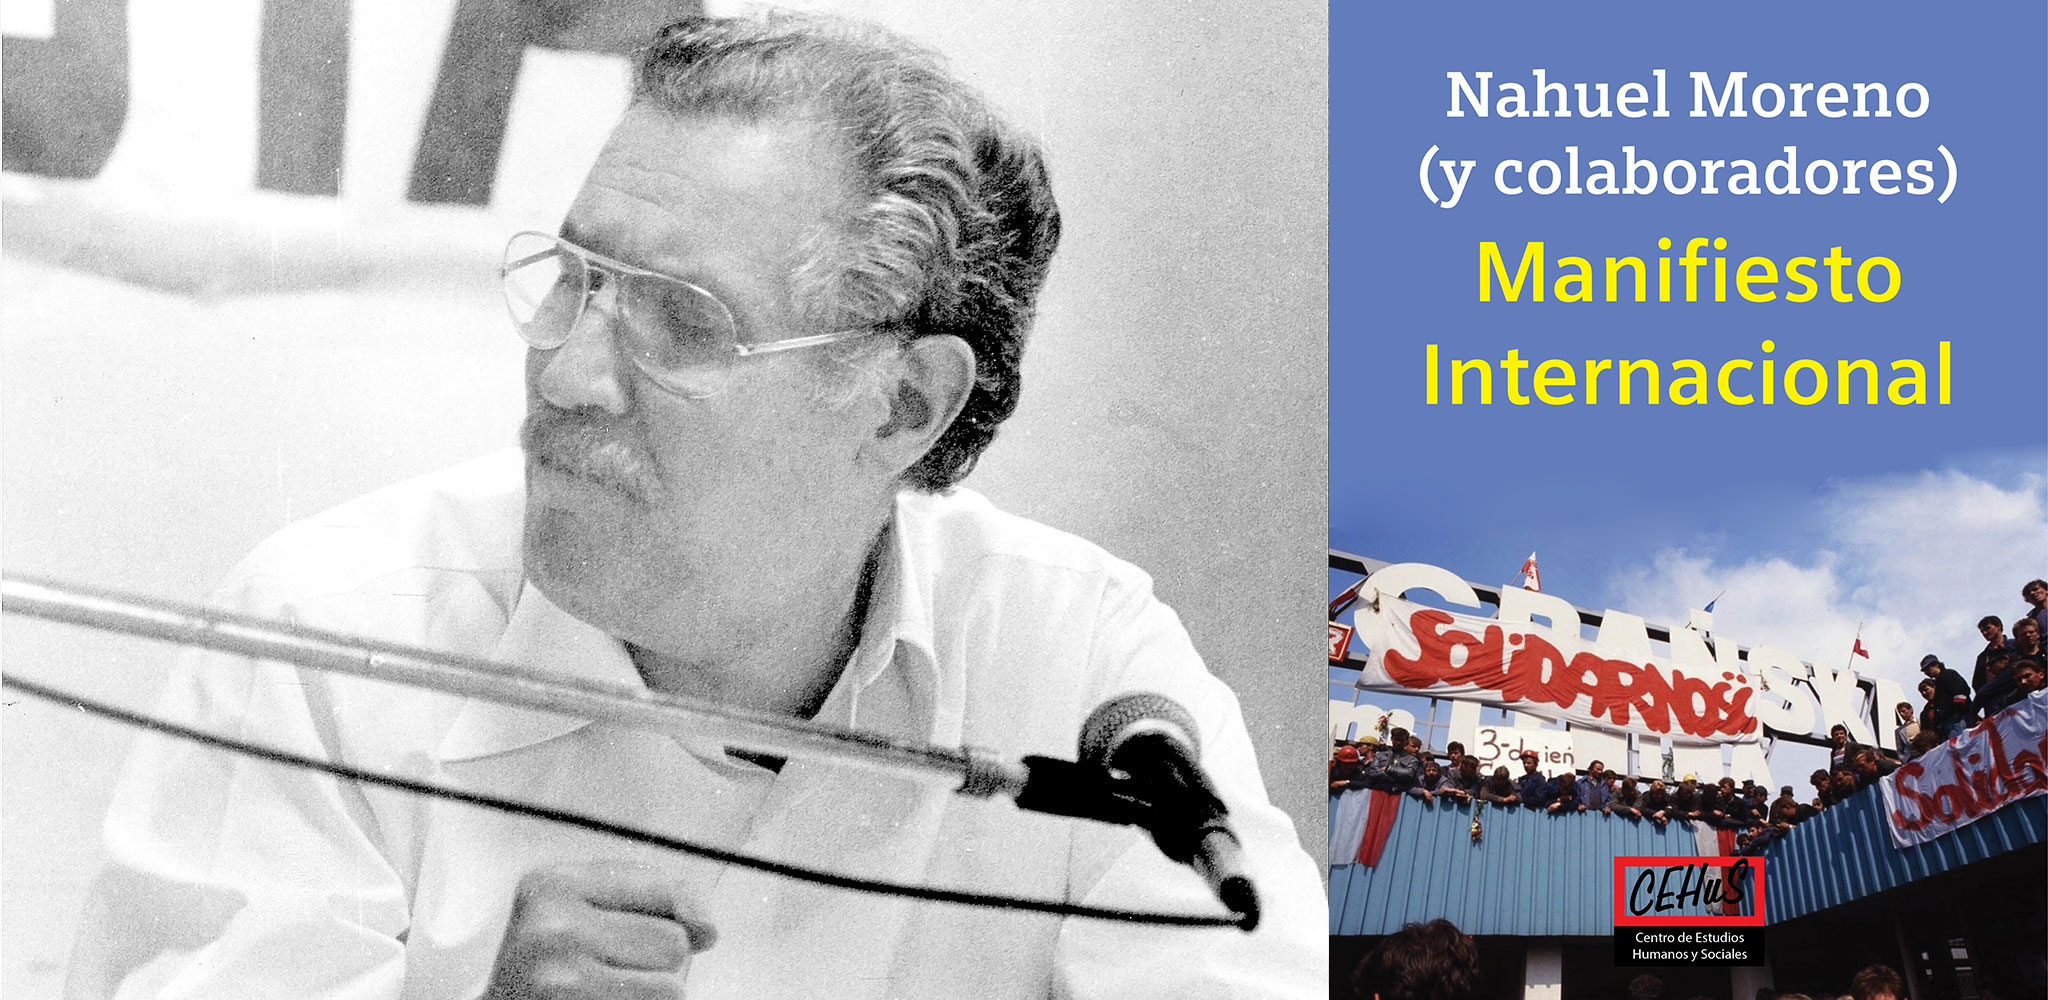 MANIFIESTO INTERNACIONAL (1985)